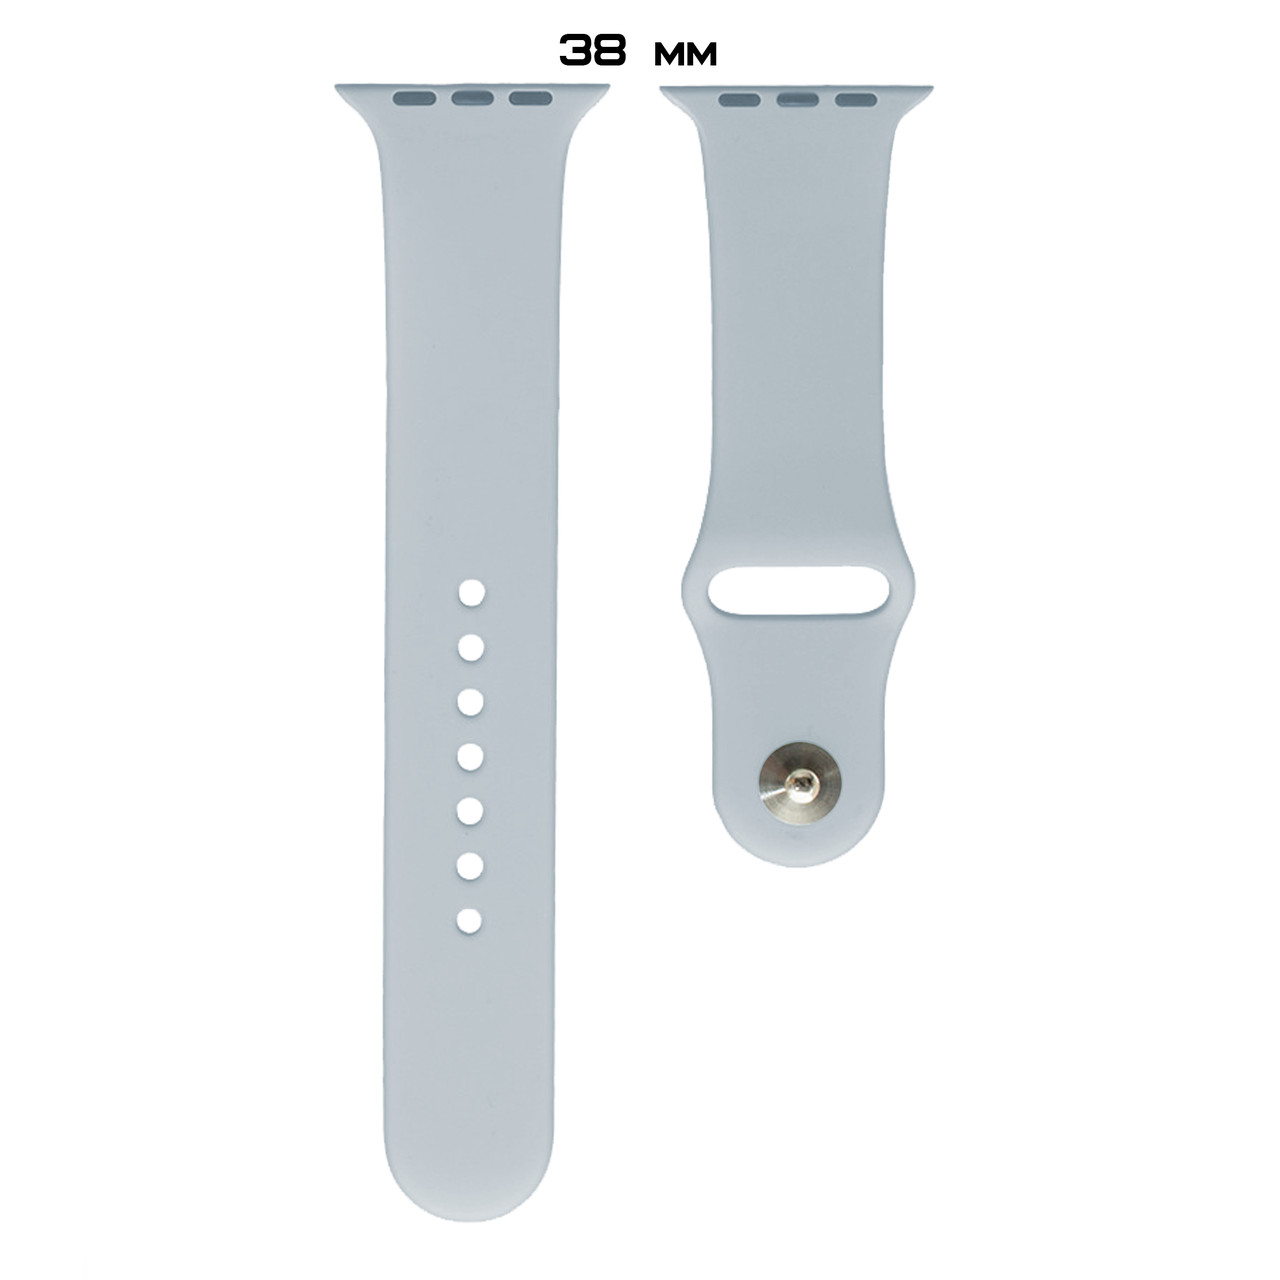 Ремешок Apple Watch Silicone 38/40mm (26) Mist blue